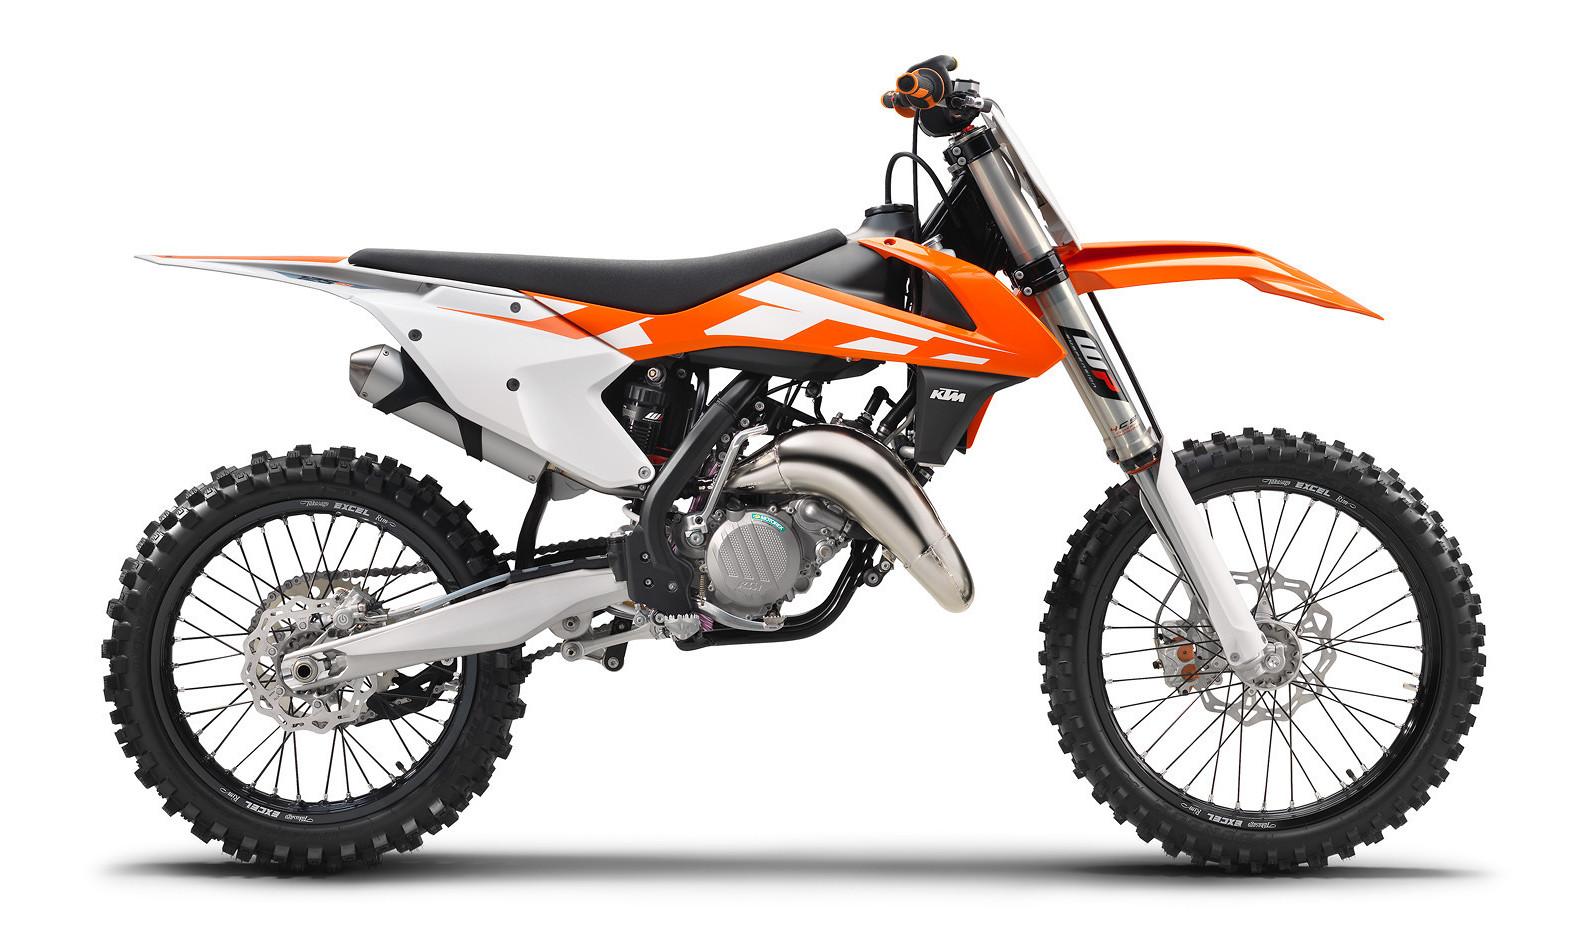 2016 KTM 125SX  s1600_125_SX_90Grad